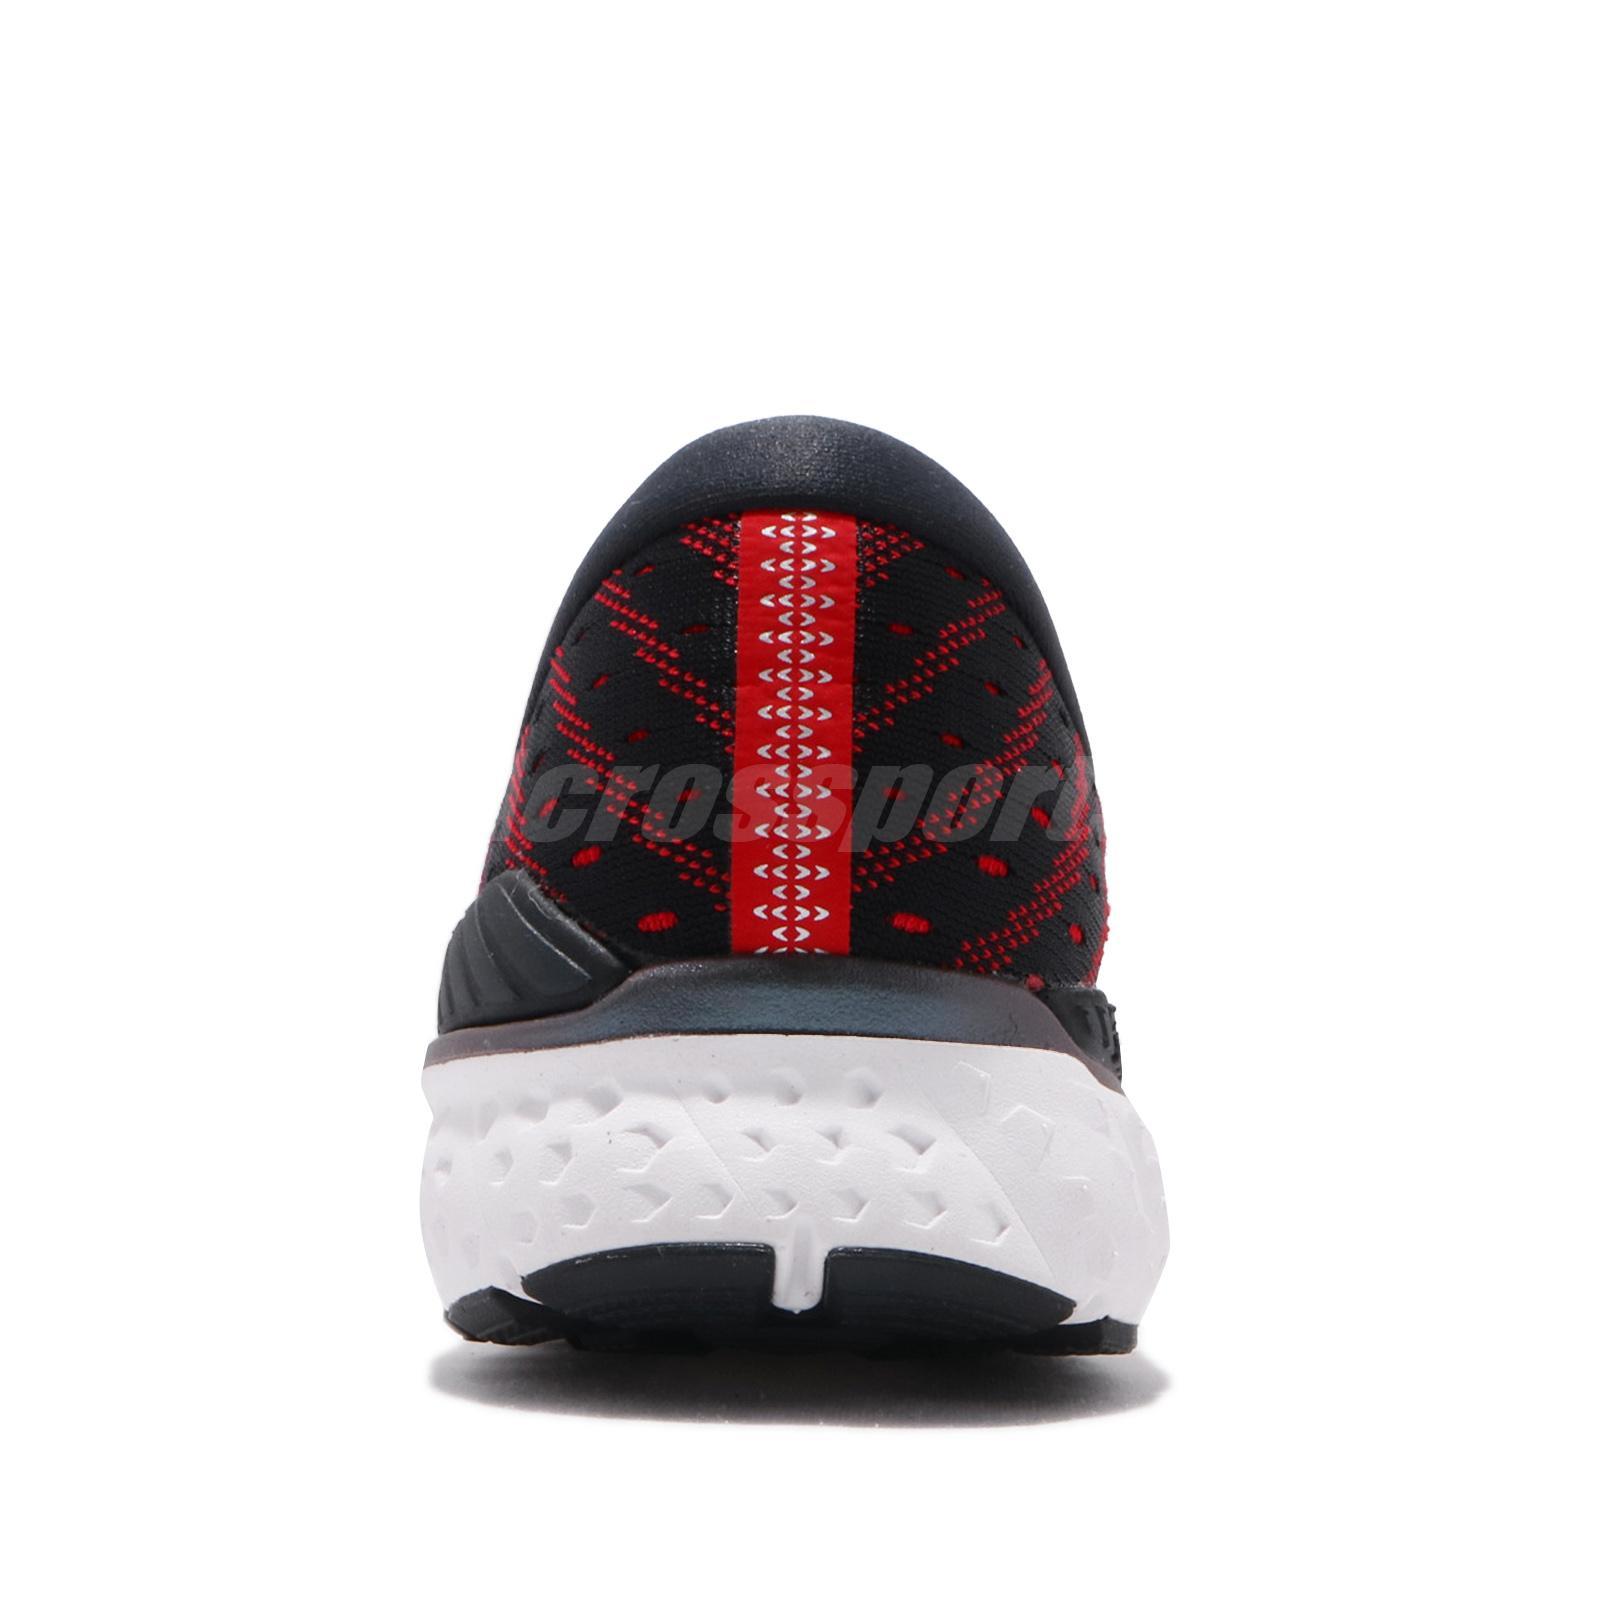 Men Brooks Transcend 6 Black Ebony Red White Men Running Shoes Sneakers 110299 1D Shoes